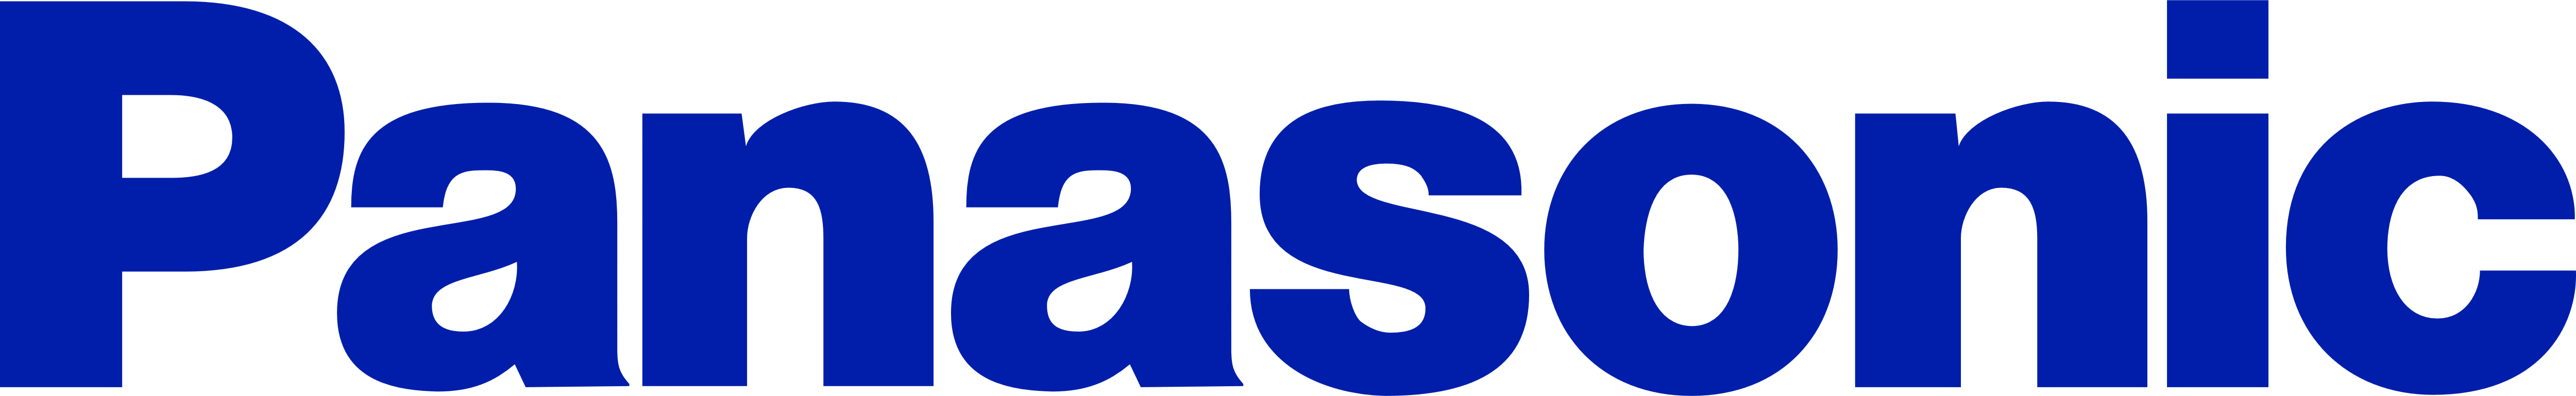 Panasonic - Panasonic PNG